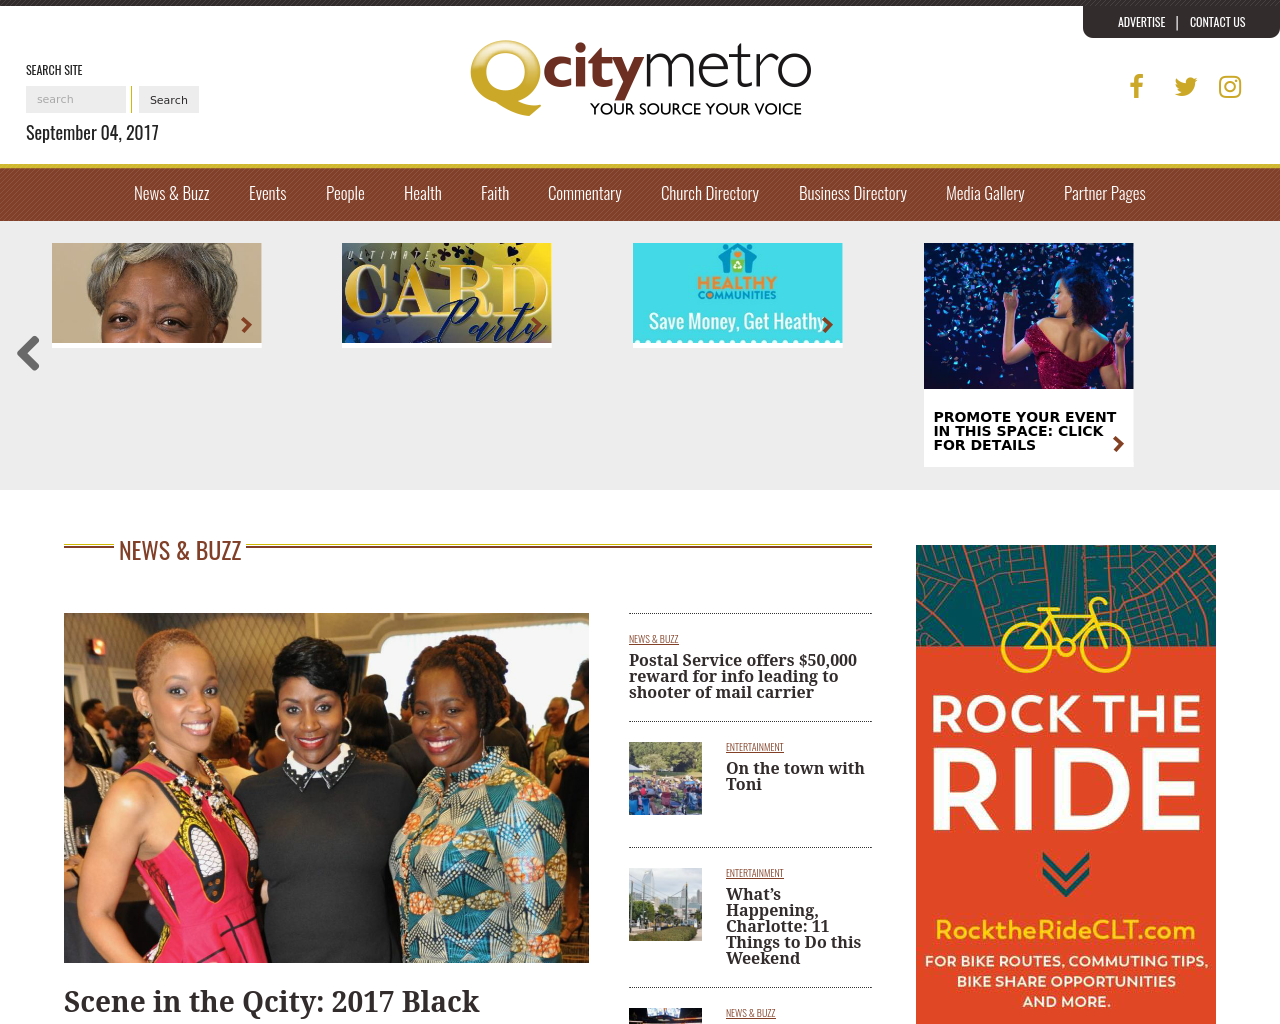 Qcitymetro-Advertising-Reviews-Pricing